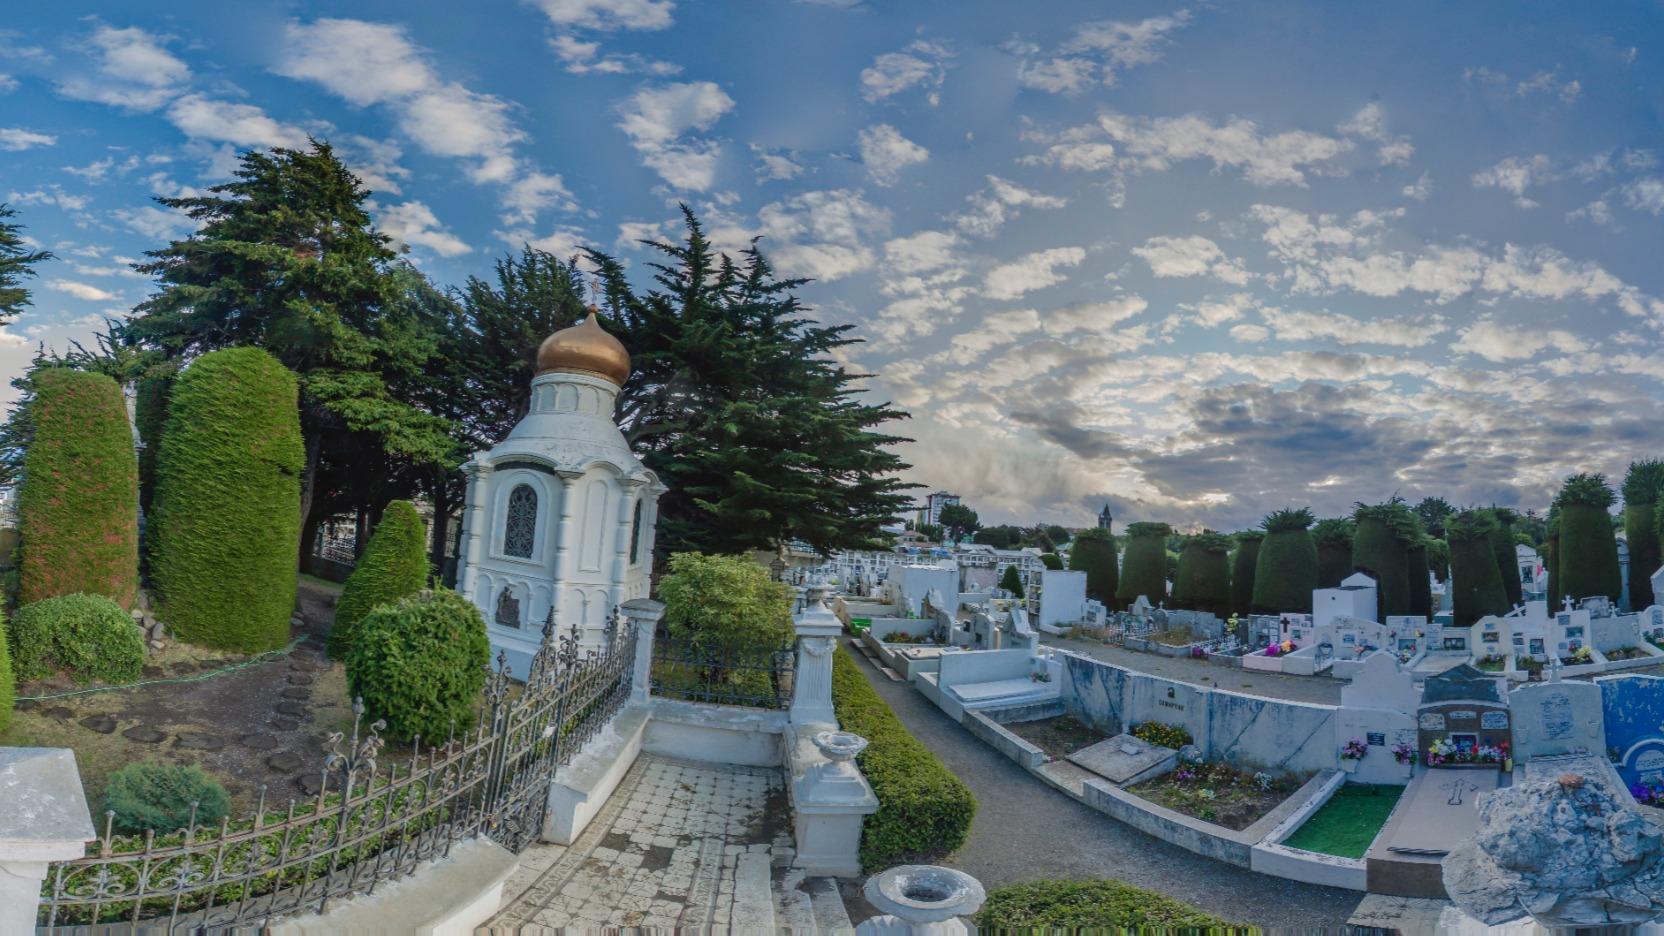 Cementerio Municipal Sara Braun Punta Arenas